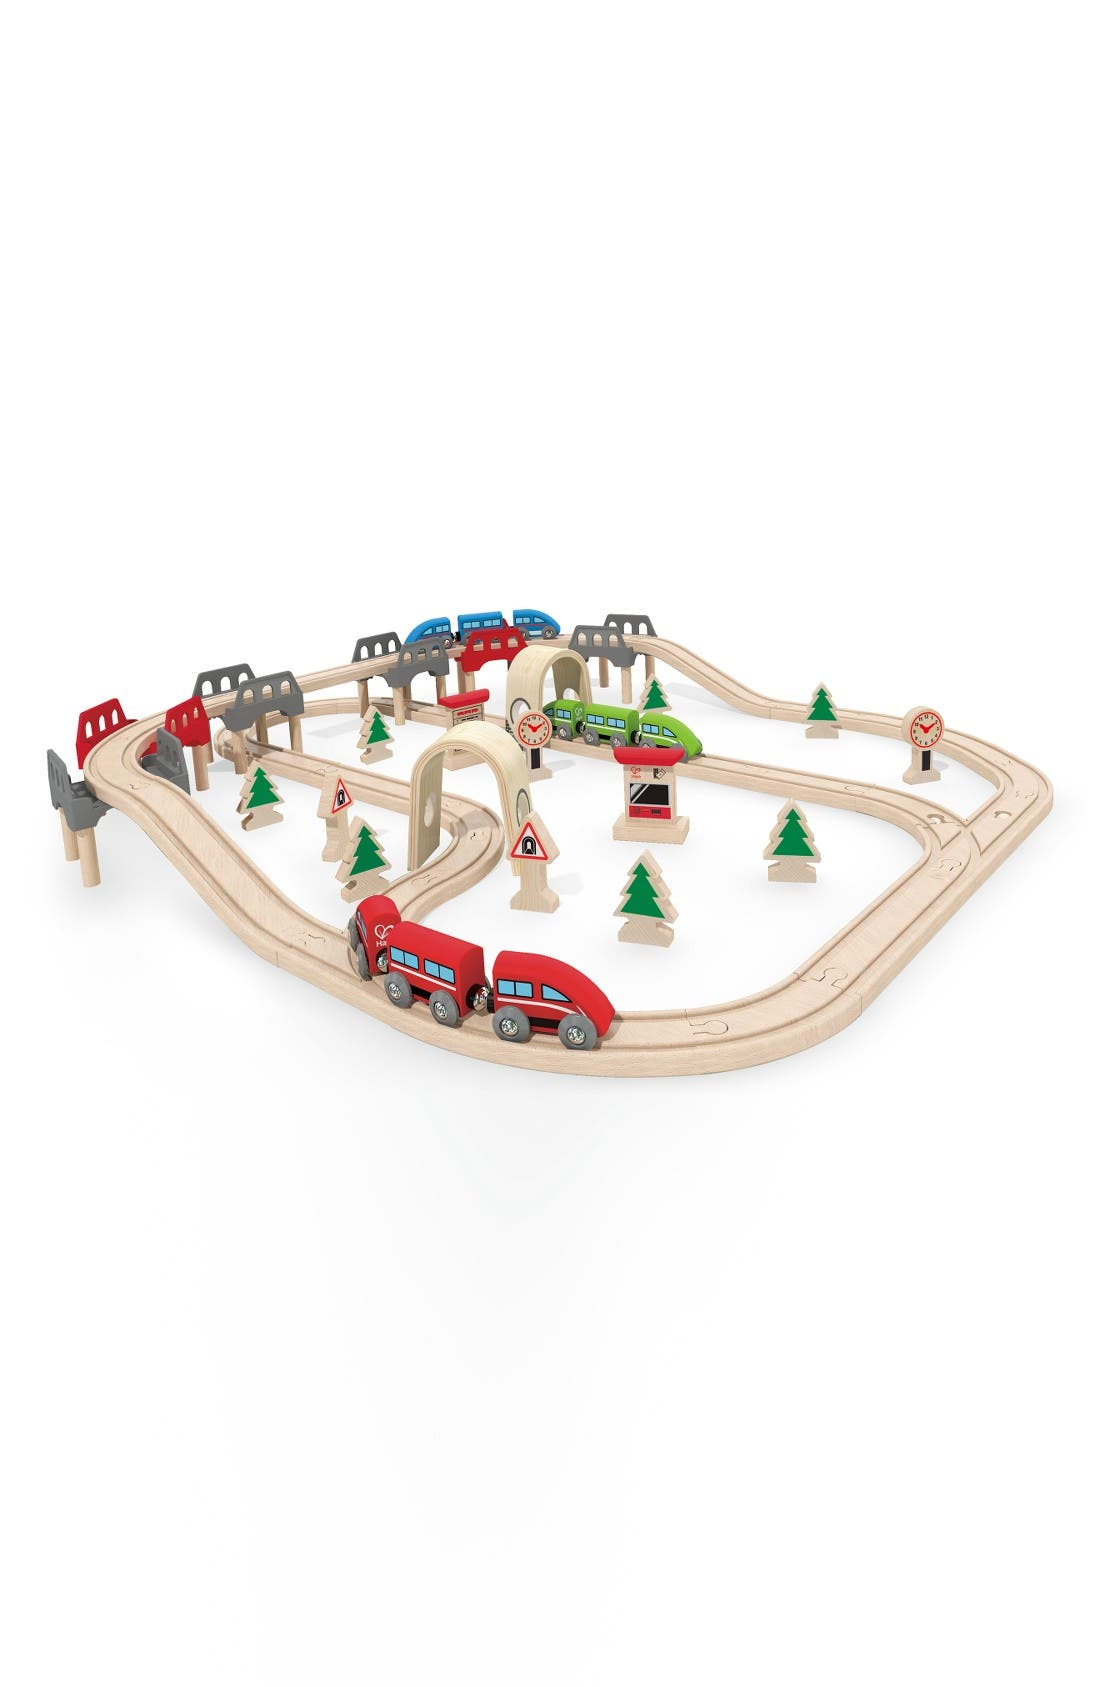 Hape High & Low Railway Set